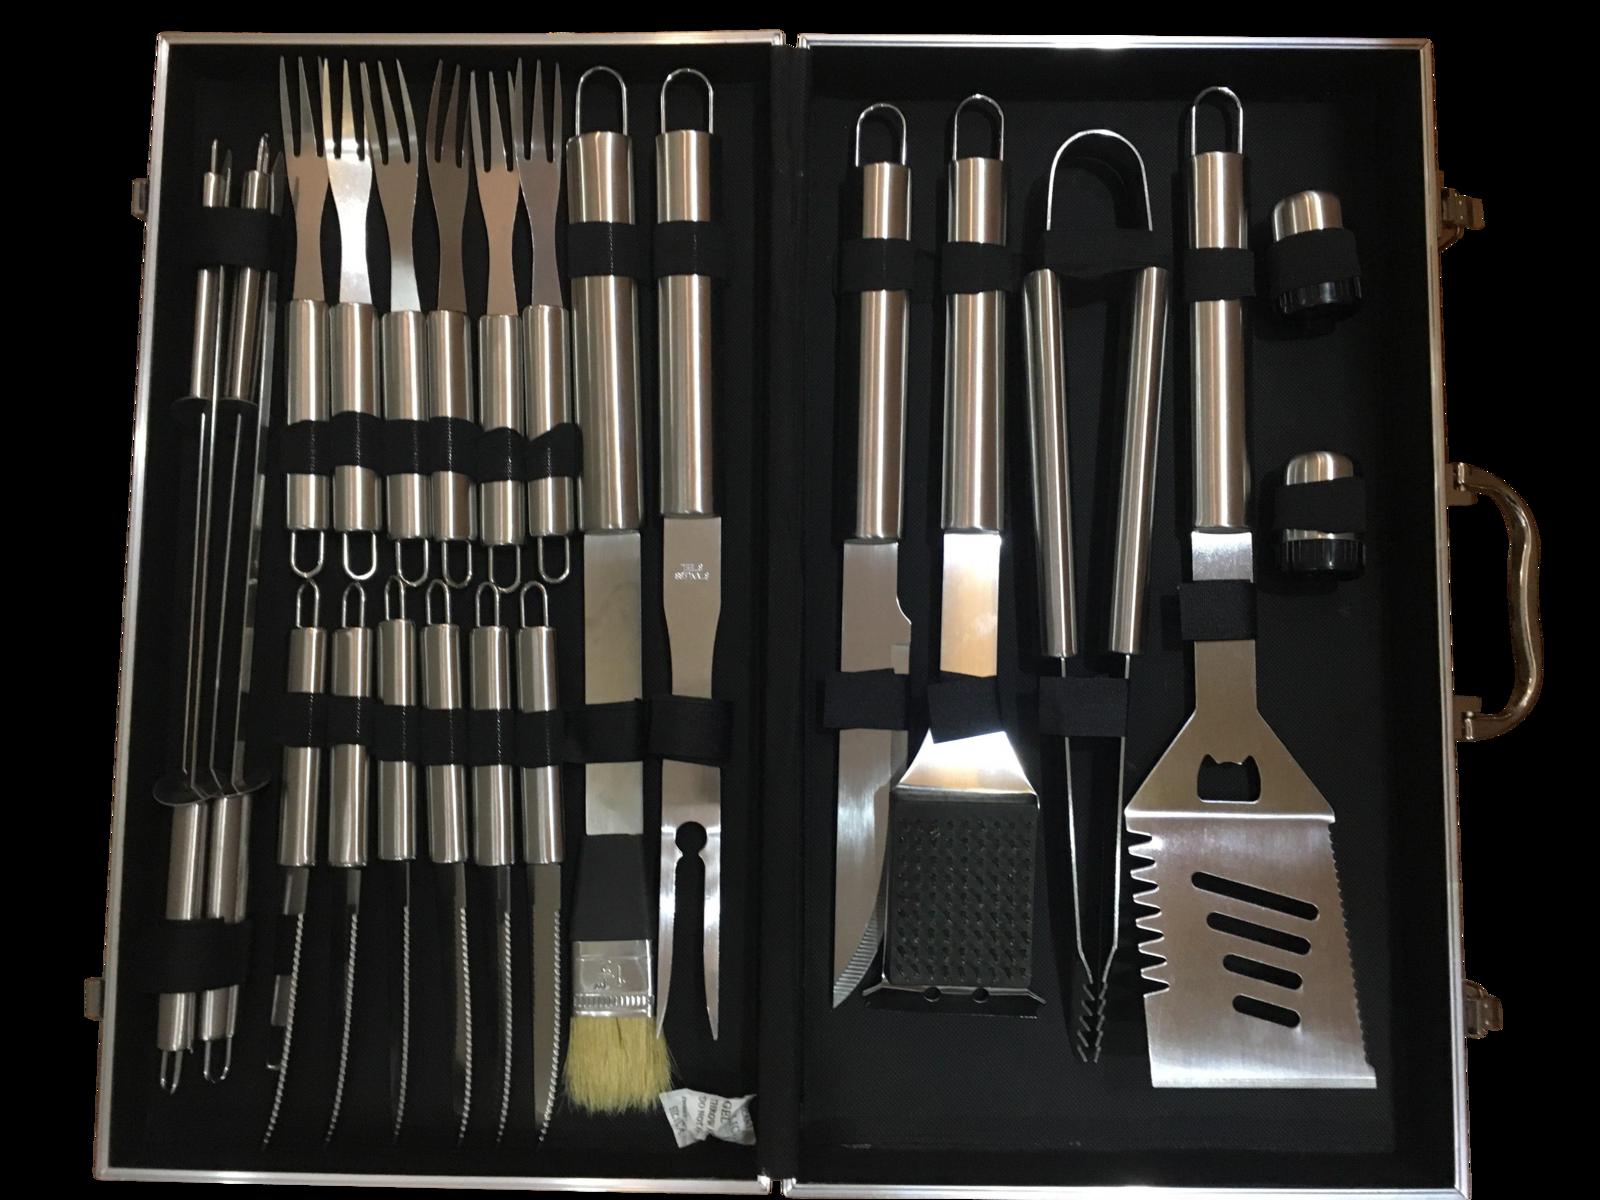 BBQ Grill Tool Set - 24-Piece image